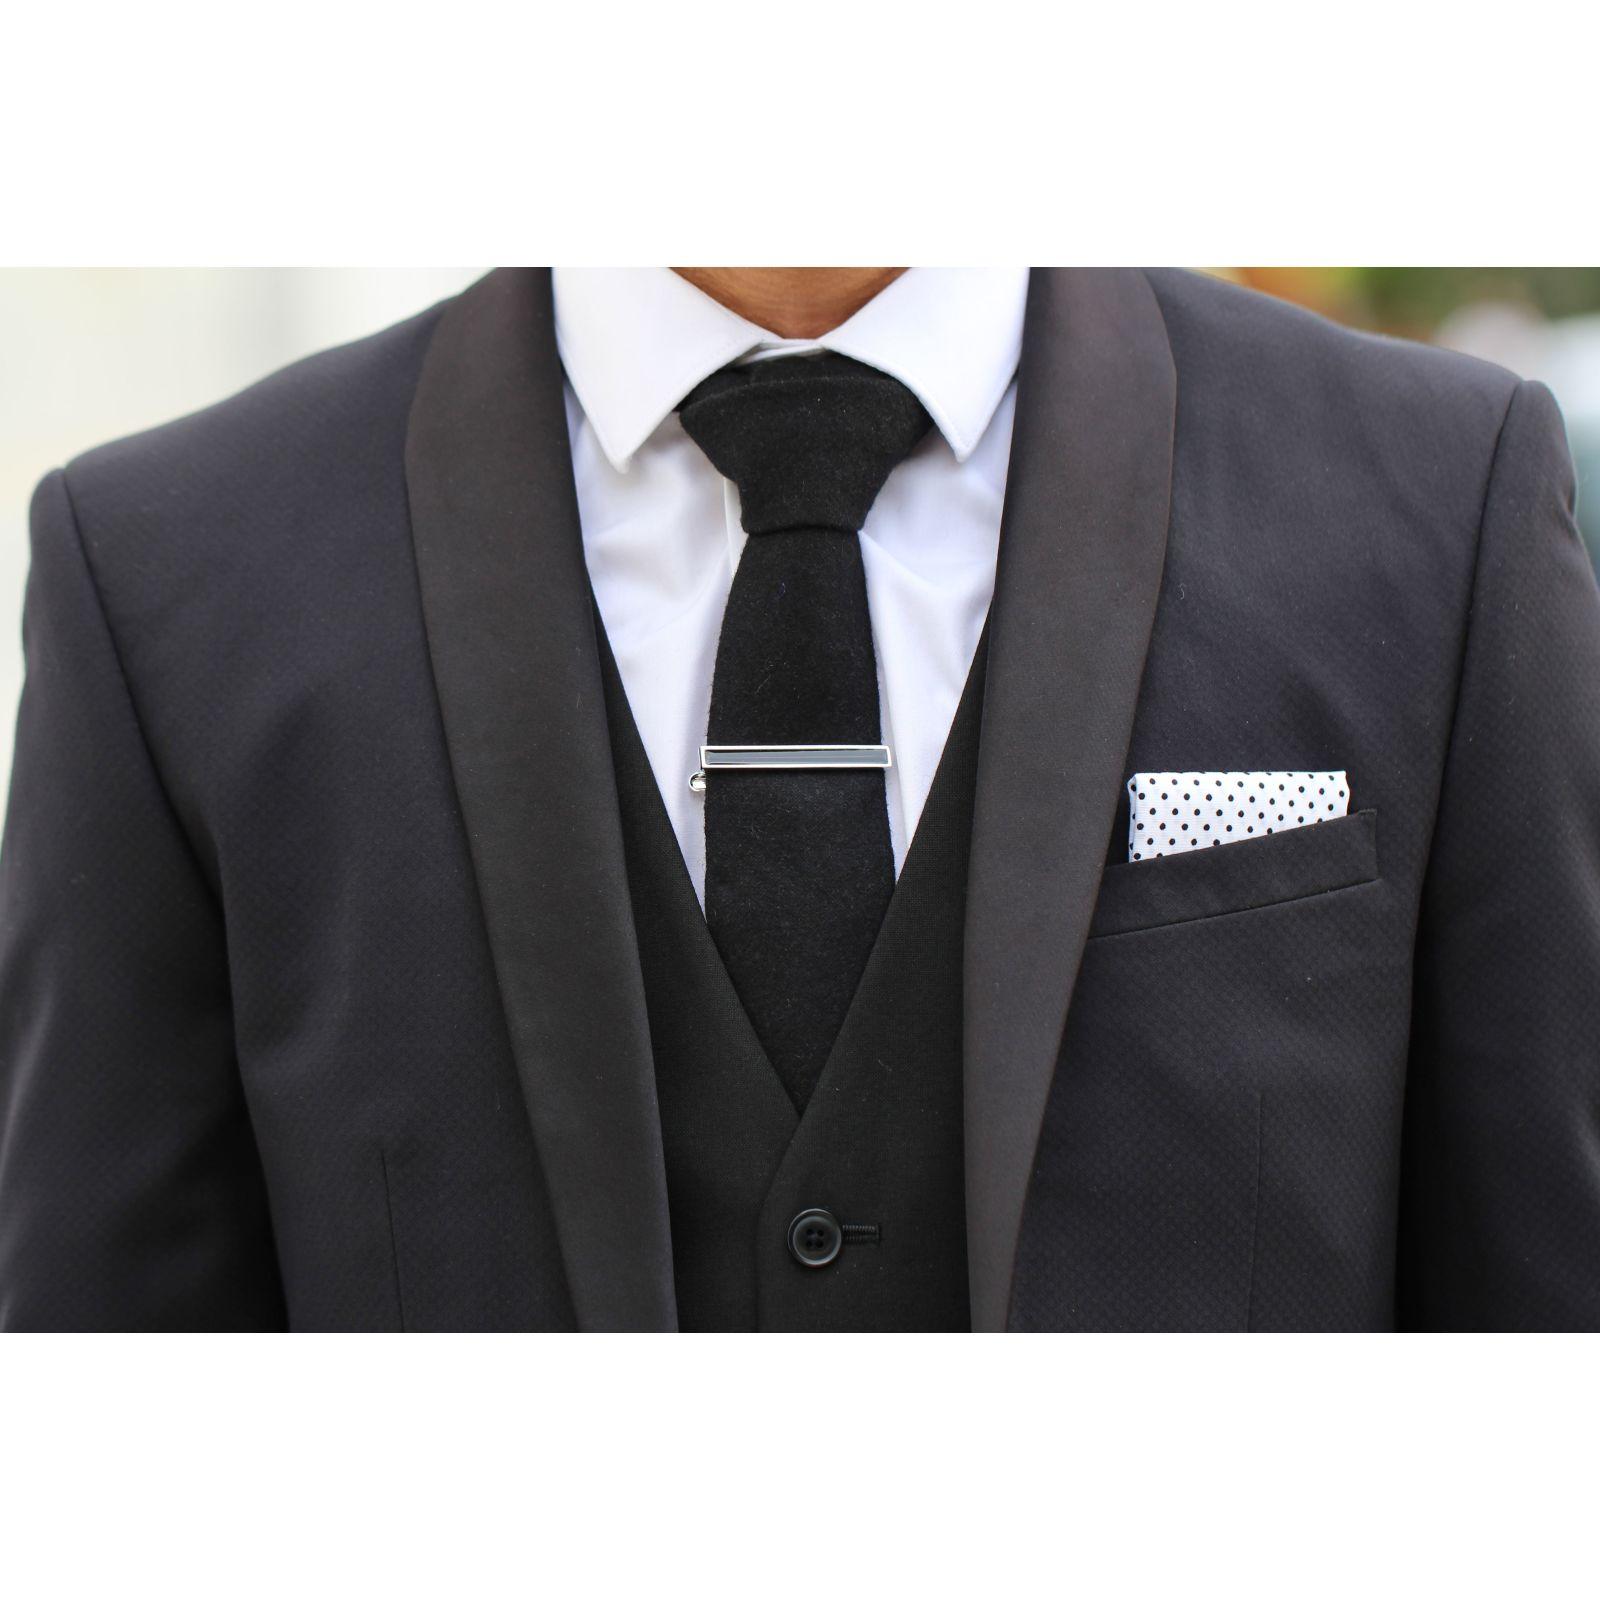 Striped Short Tie Clip Trendhim cQQqQfrPq